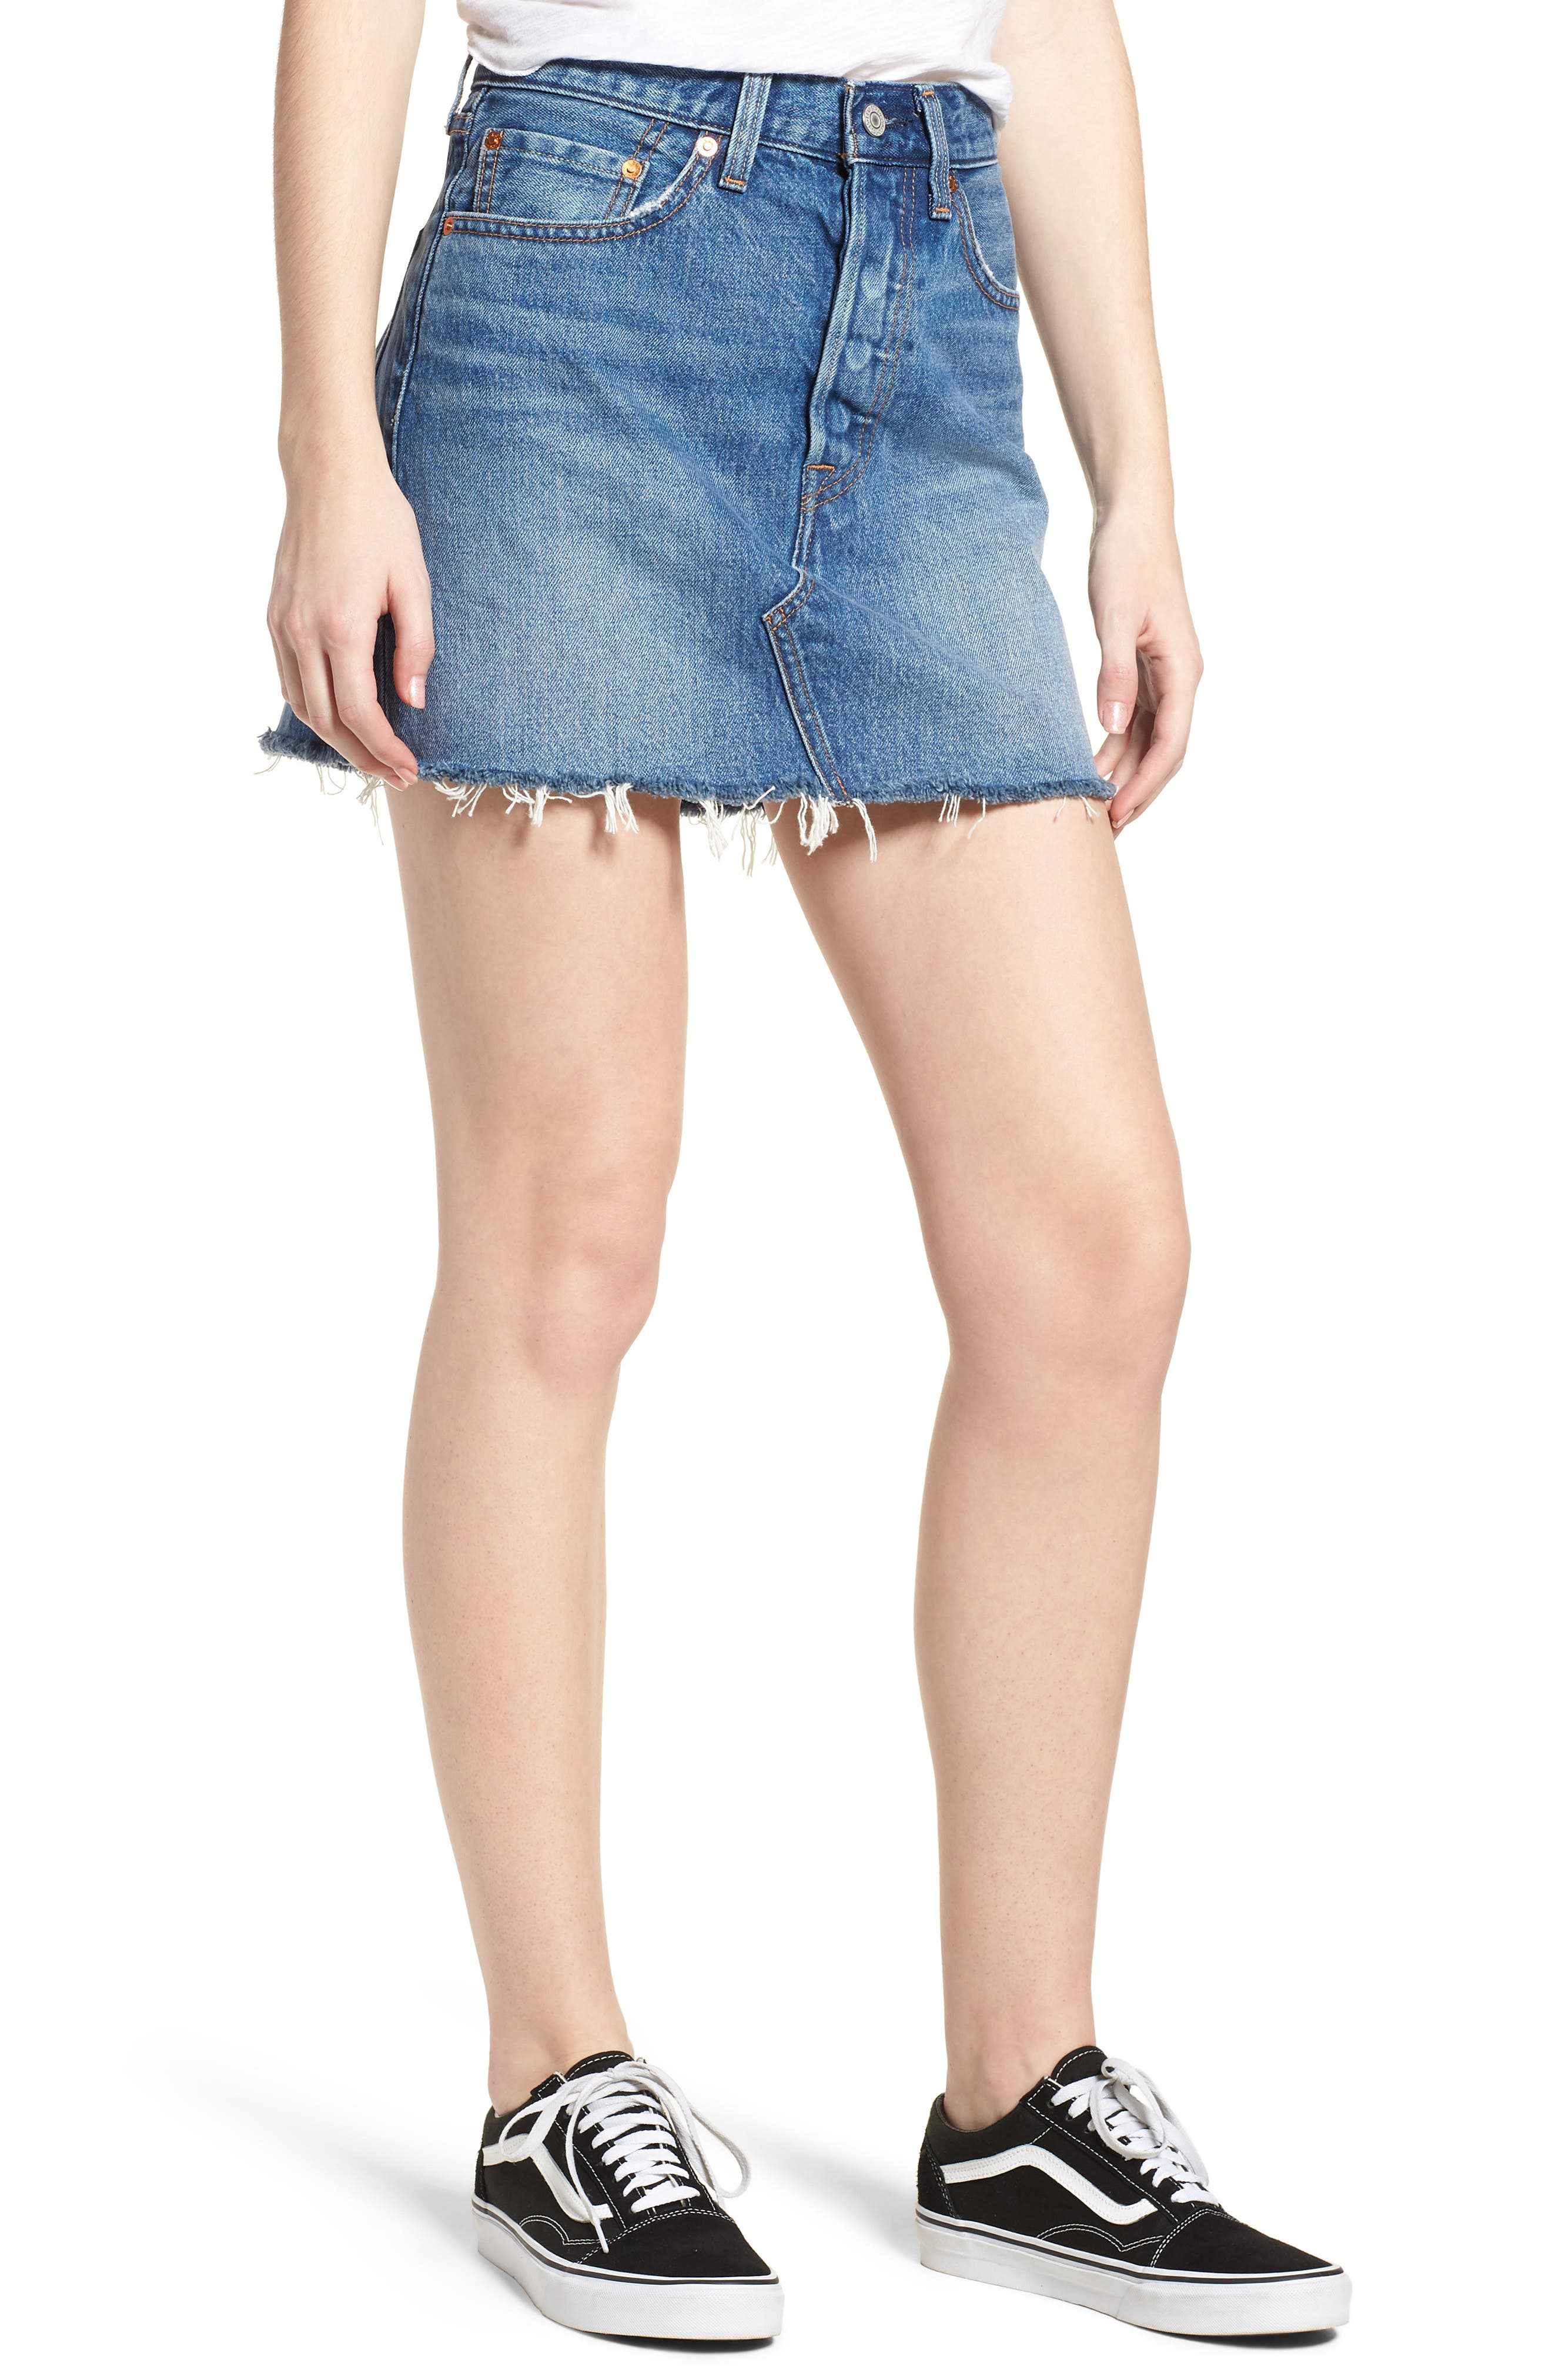 LEVI'S<SUP>®</SUP>, Deconstructed Denim Skirt, Main thumbnail 1, color, MIDDLE MAN